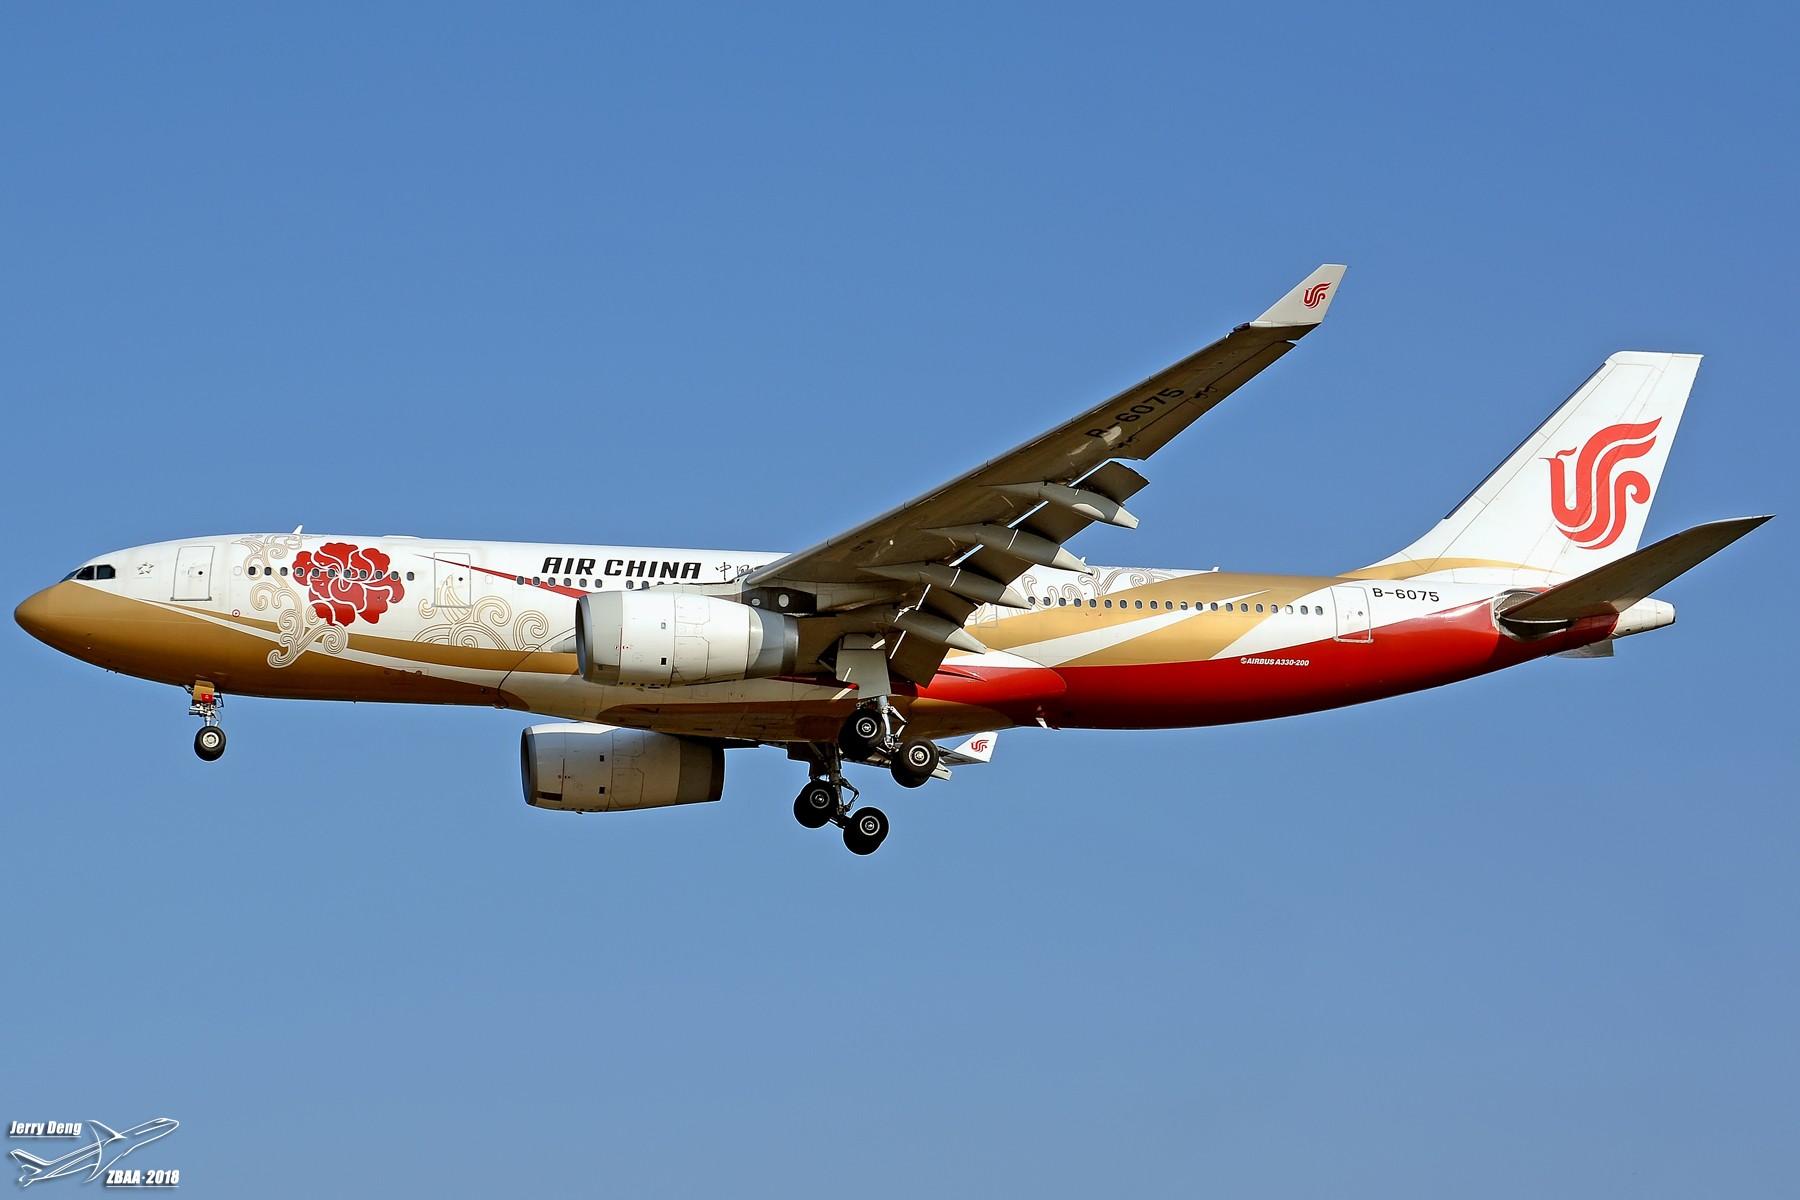 Re:[原创]【多图党】出差赶上天气不错ZBAA随拍 AIRBUS A330-200 B-6075 中国北京首都国际机场